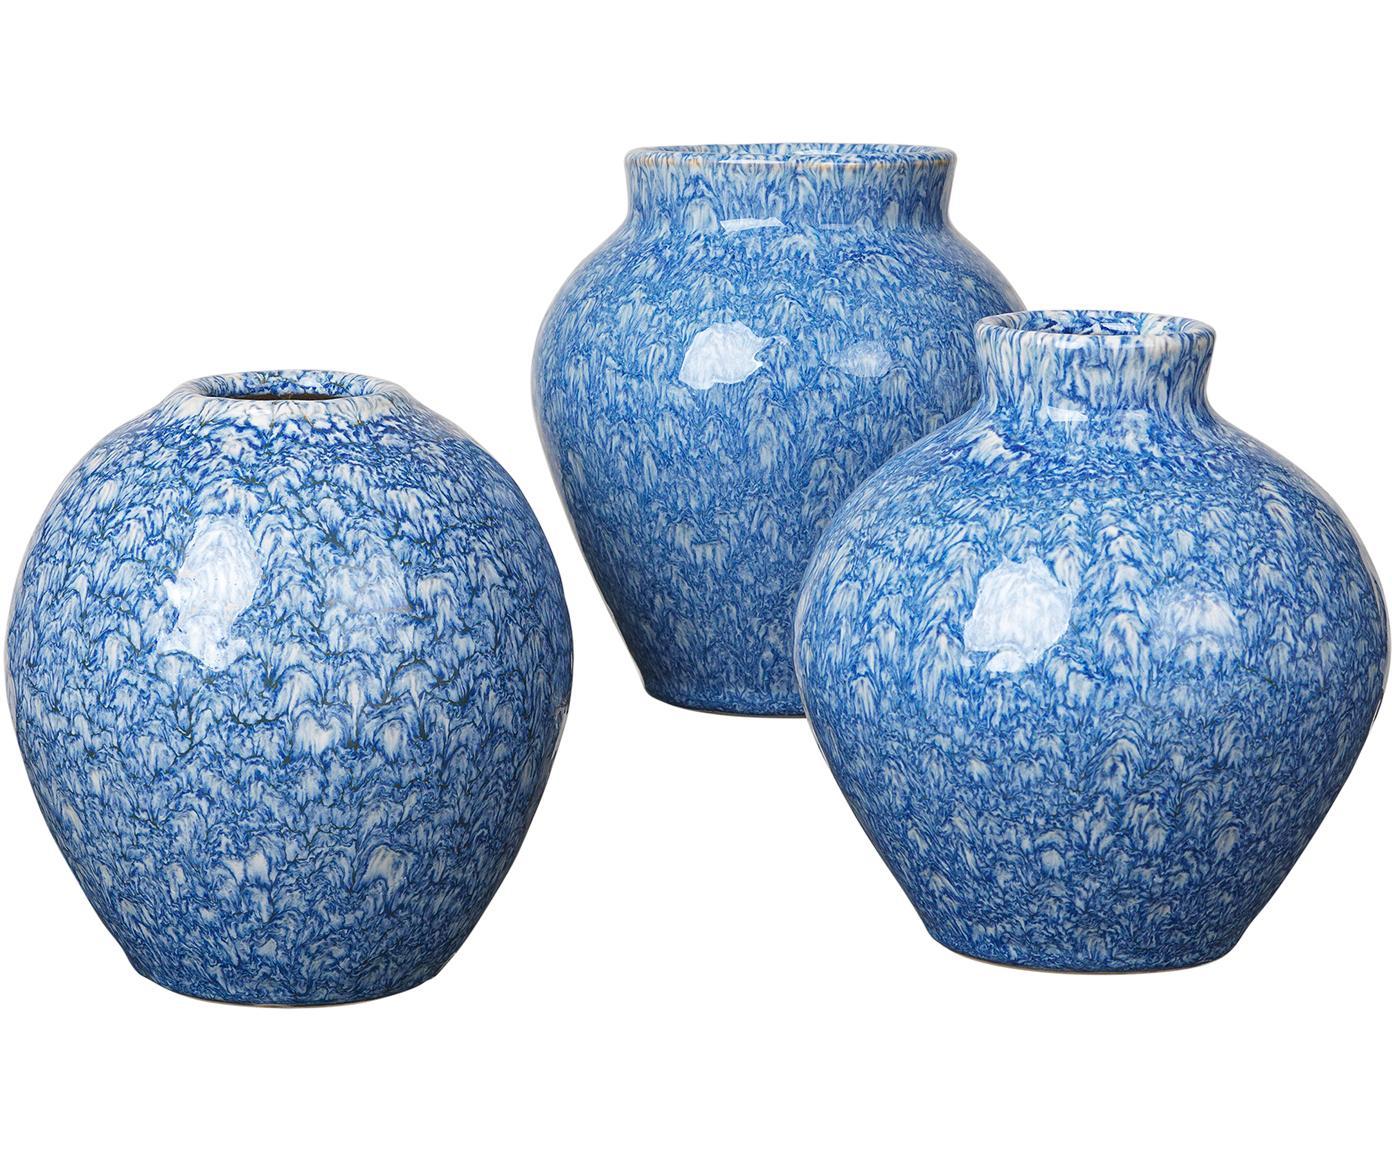 Vasen-Set Ingrid aus Keramik, 3-tlg. , Keramik, Blautöne, Ø 14 x H 14 cm